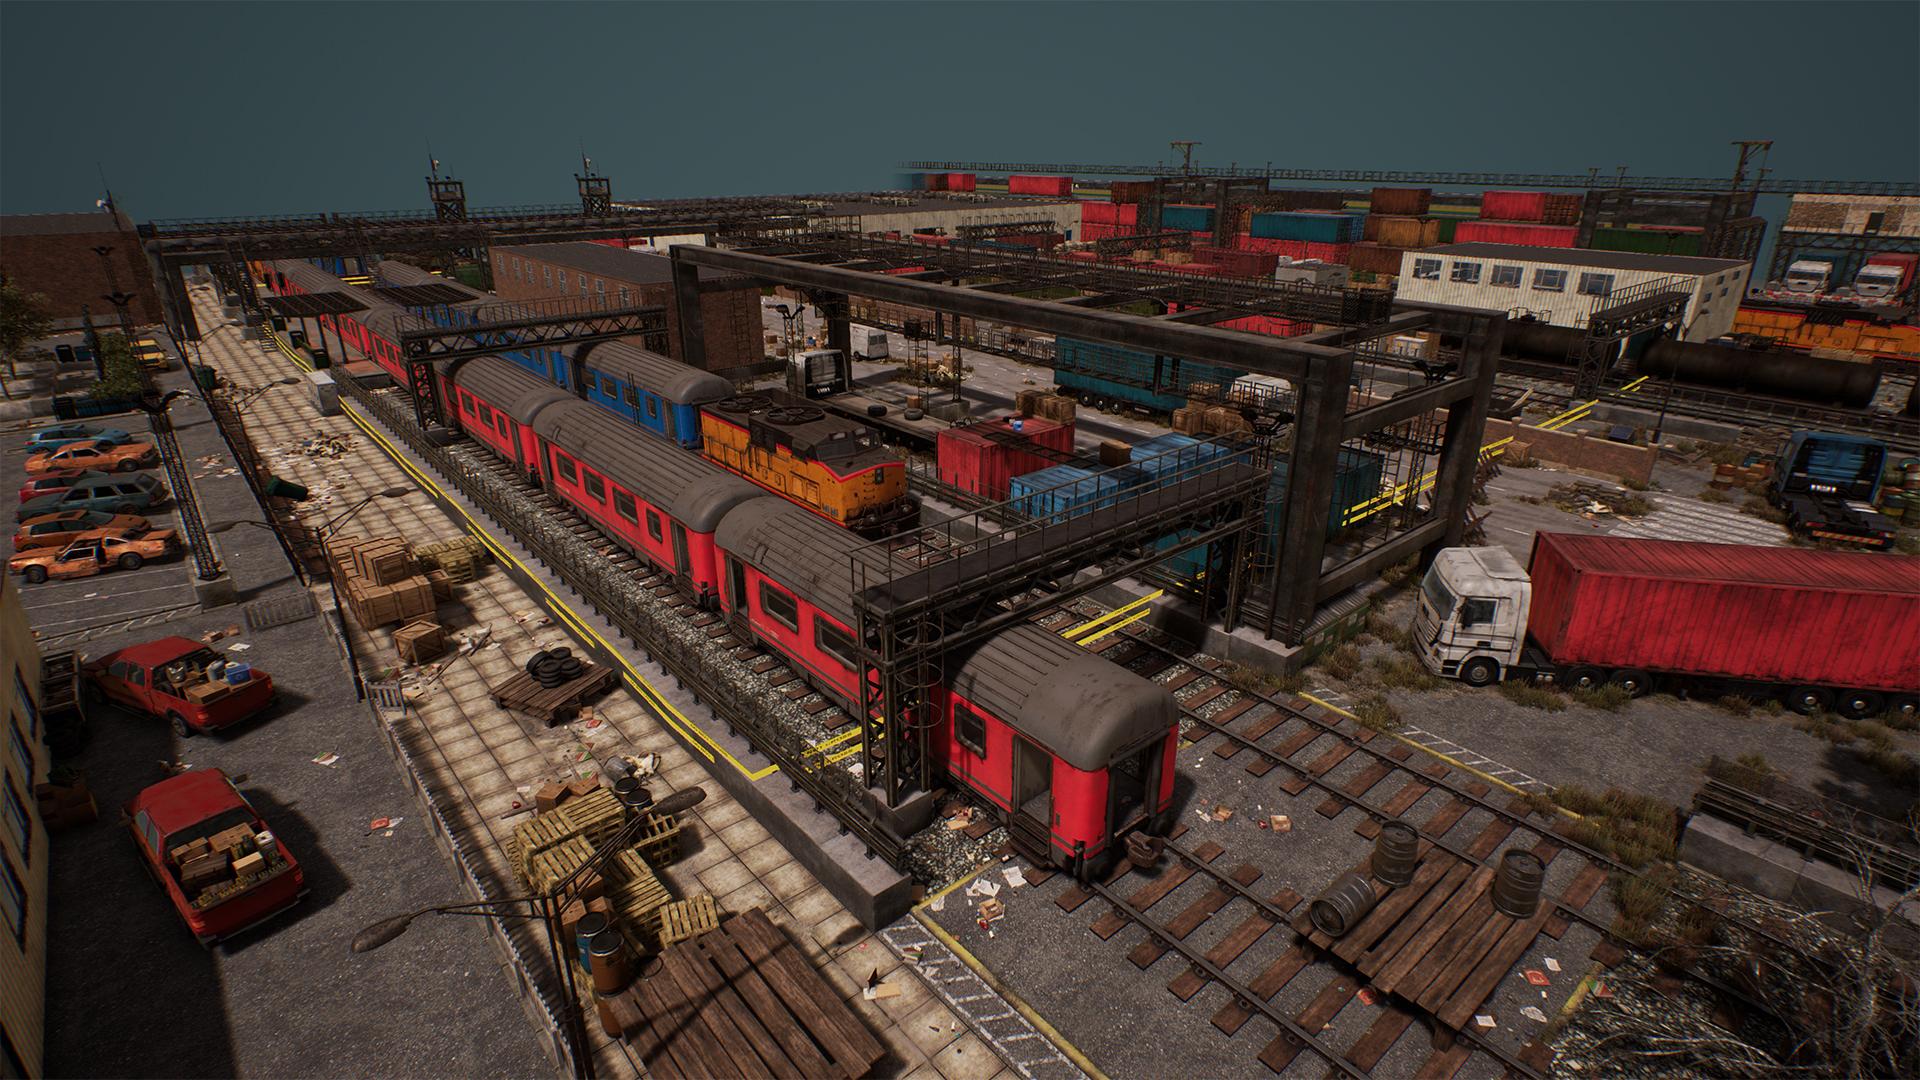 TrainDepot